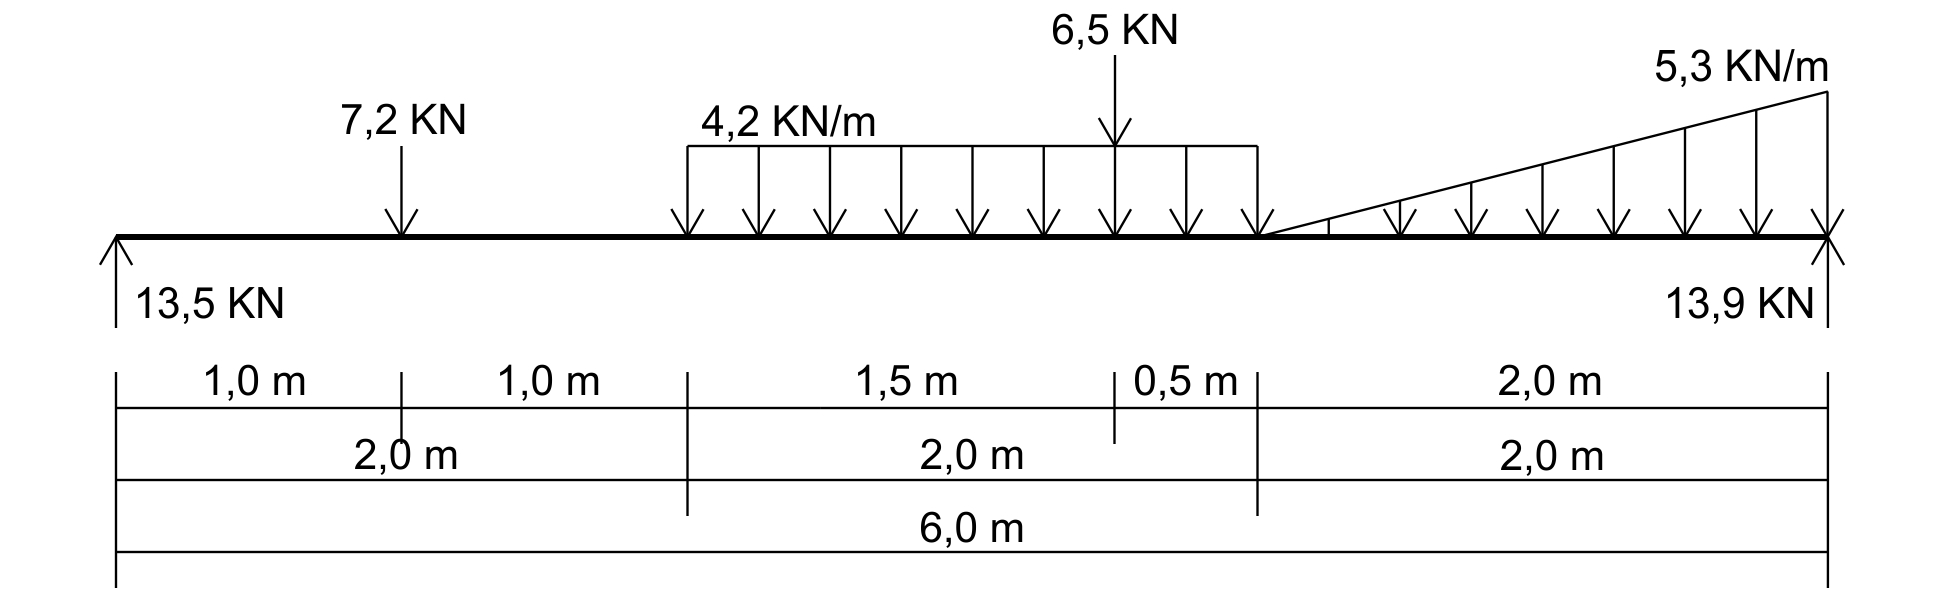 Esforço Cortante - Exemplo 2.4